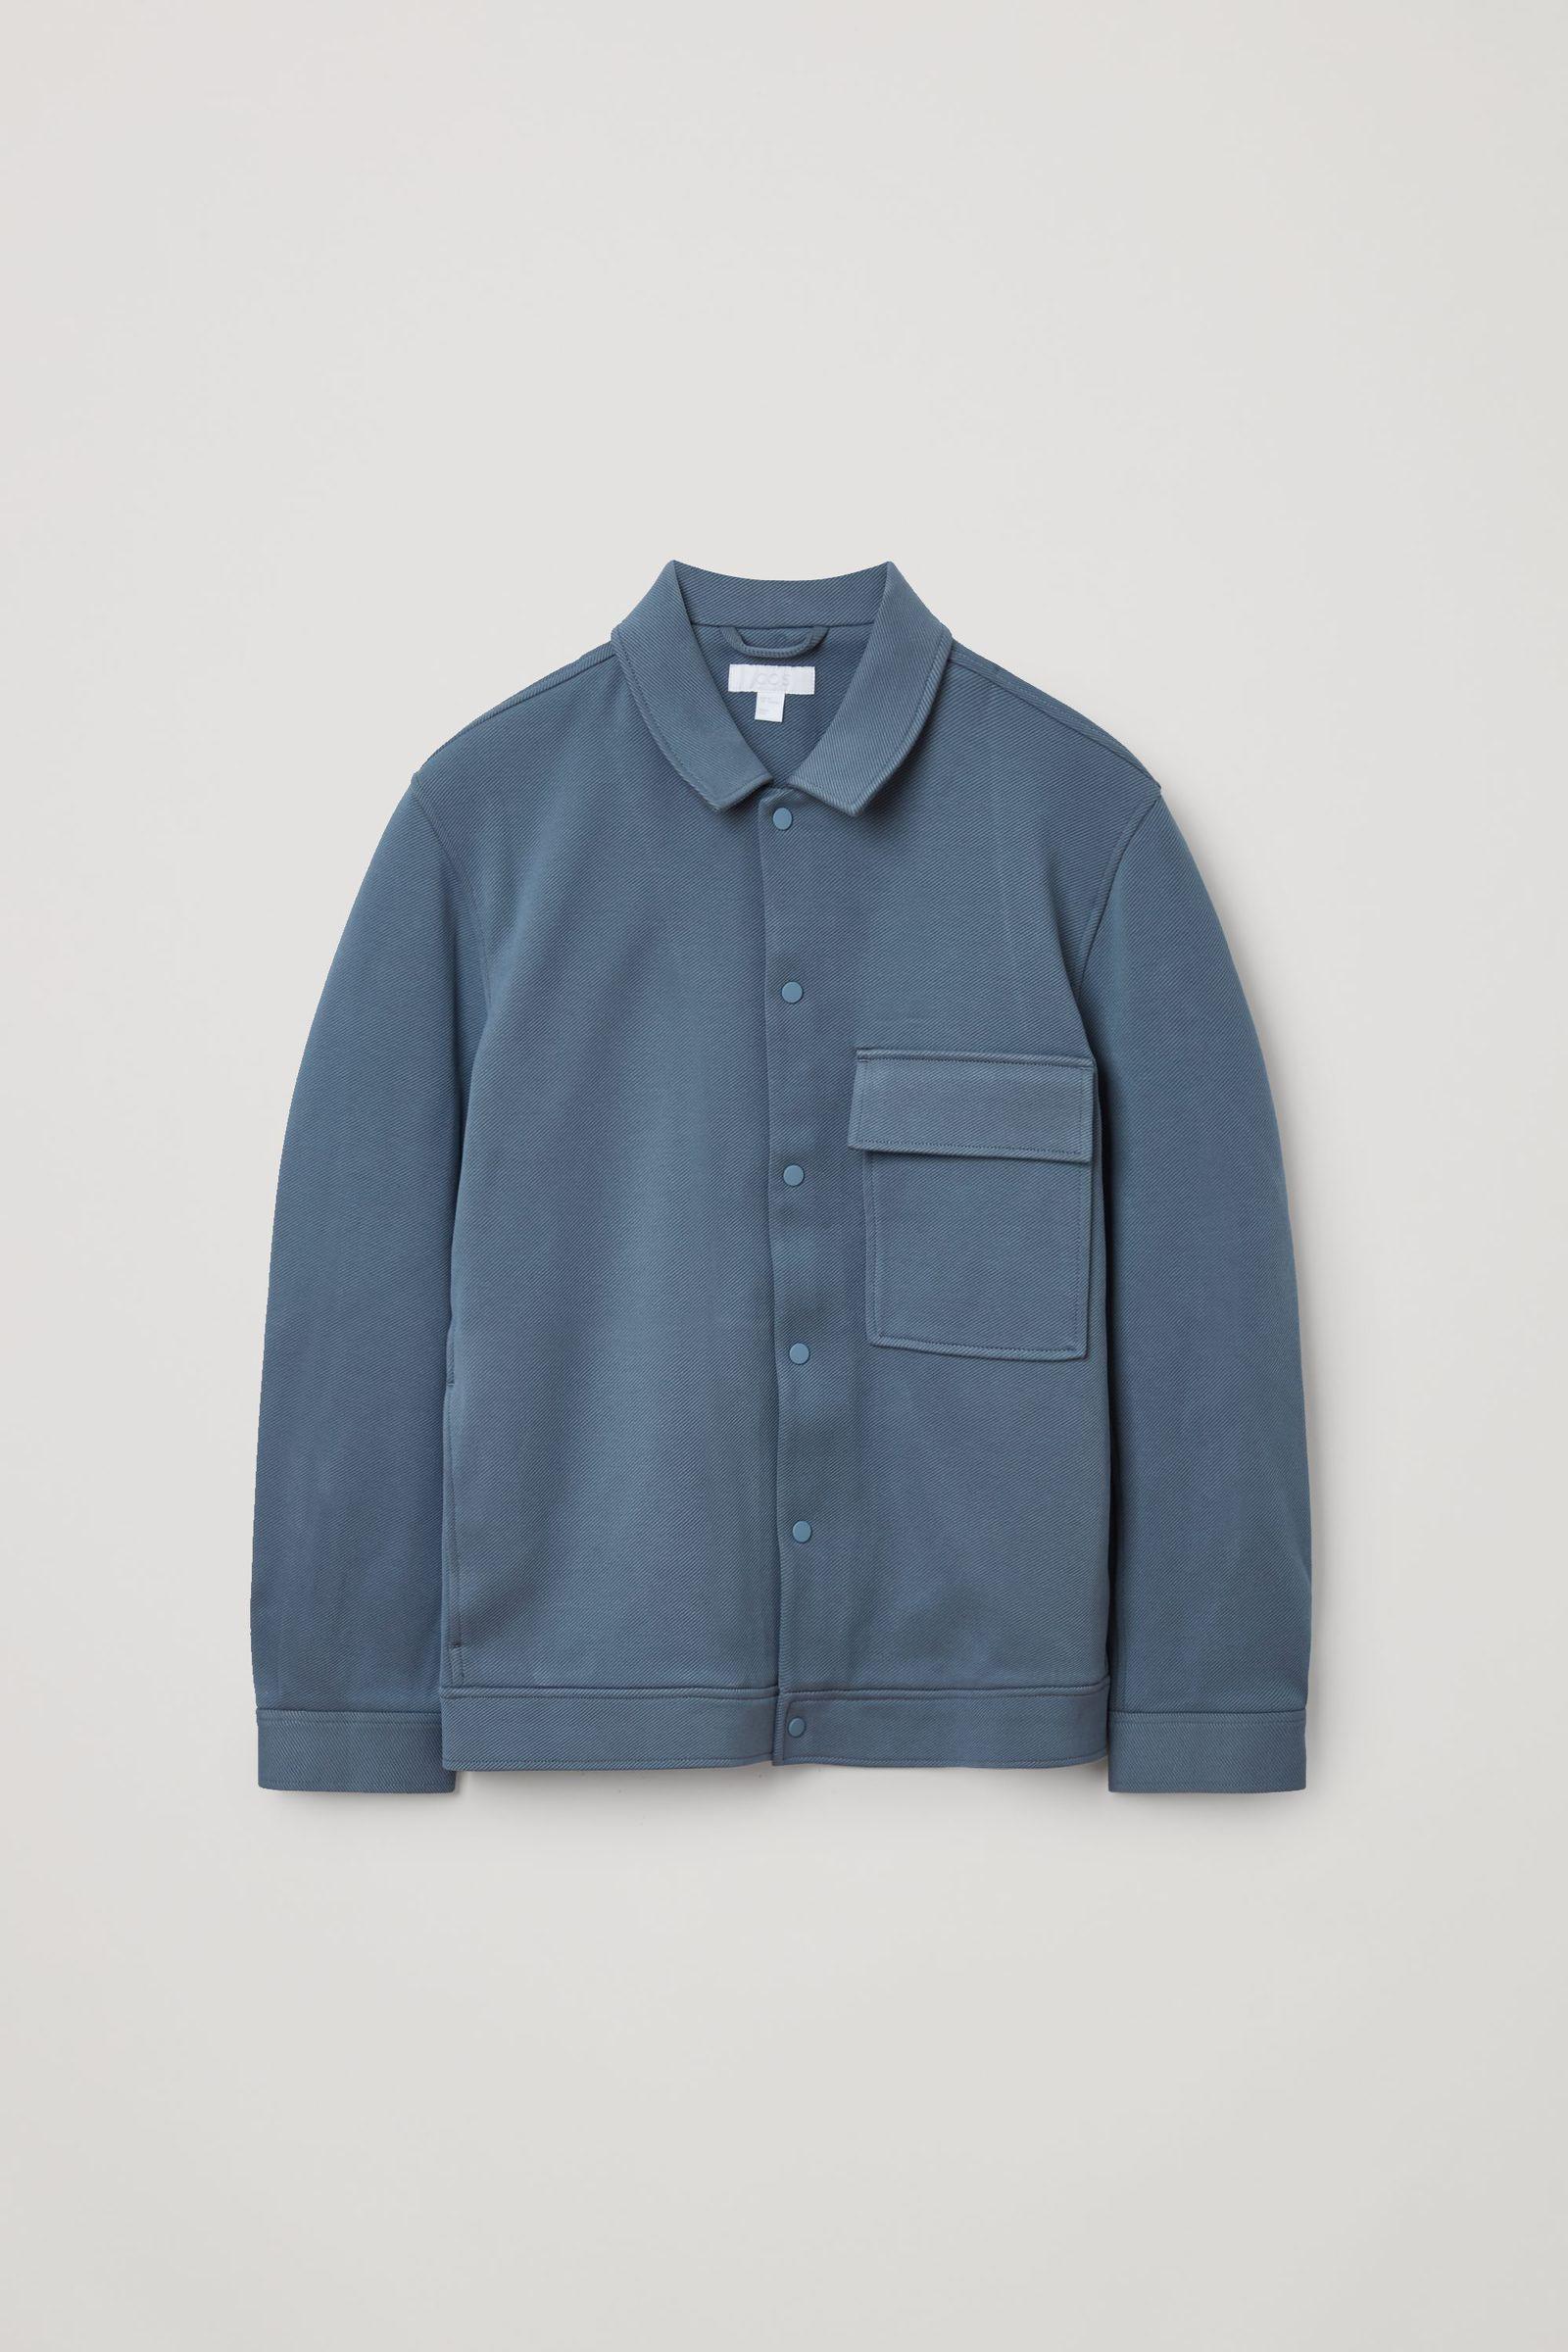 COS 코튼 트윌 셔츠 재킷의 라이트 블루컬러 Product입니다.